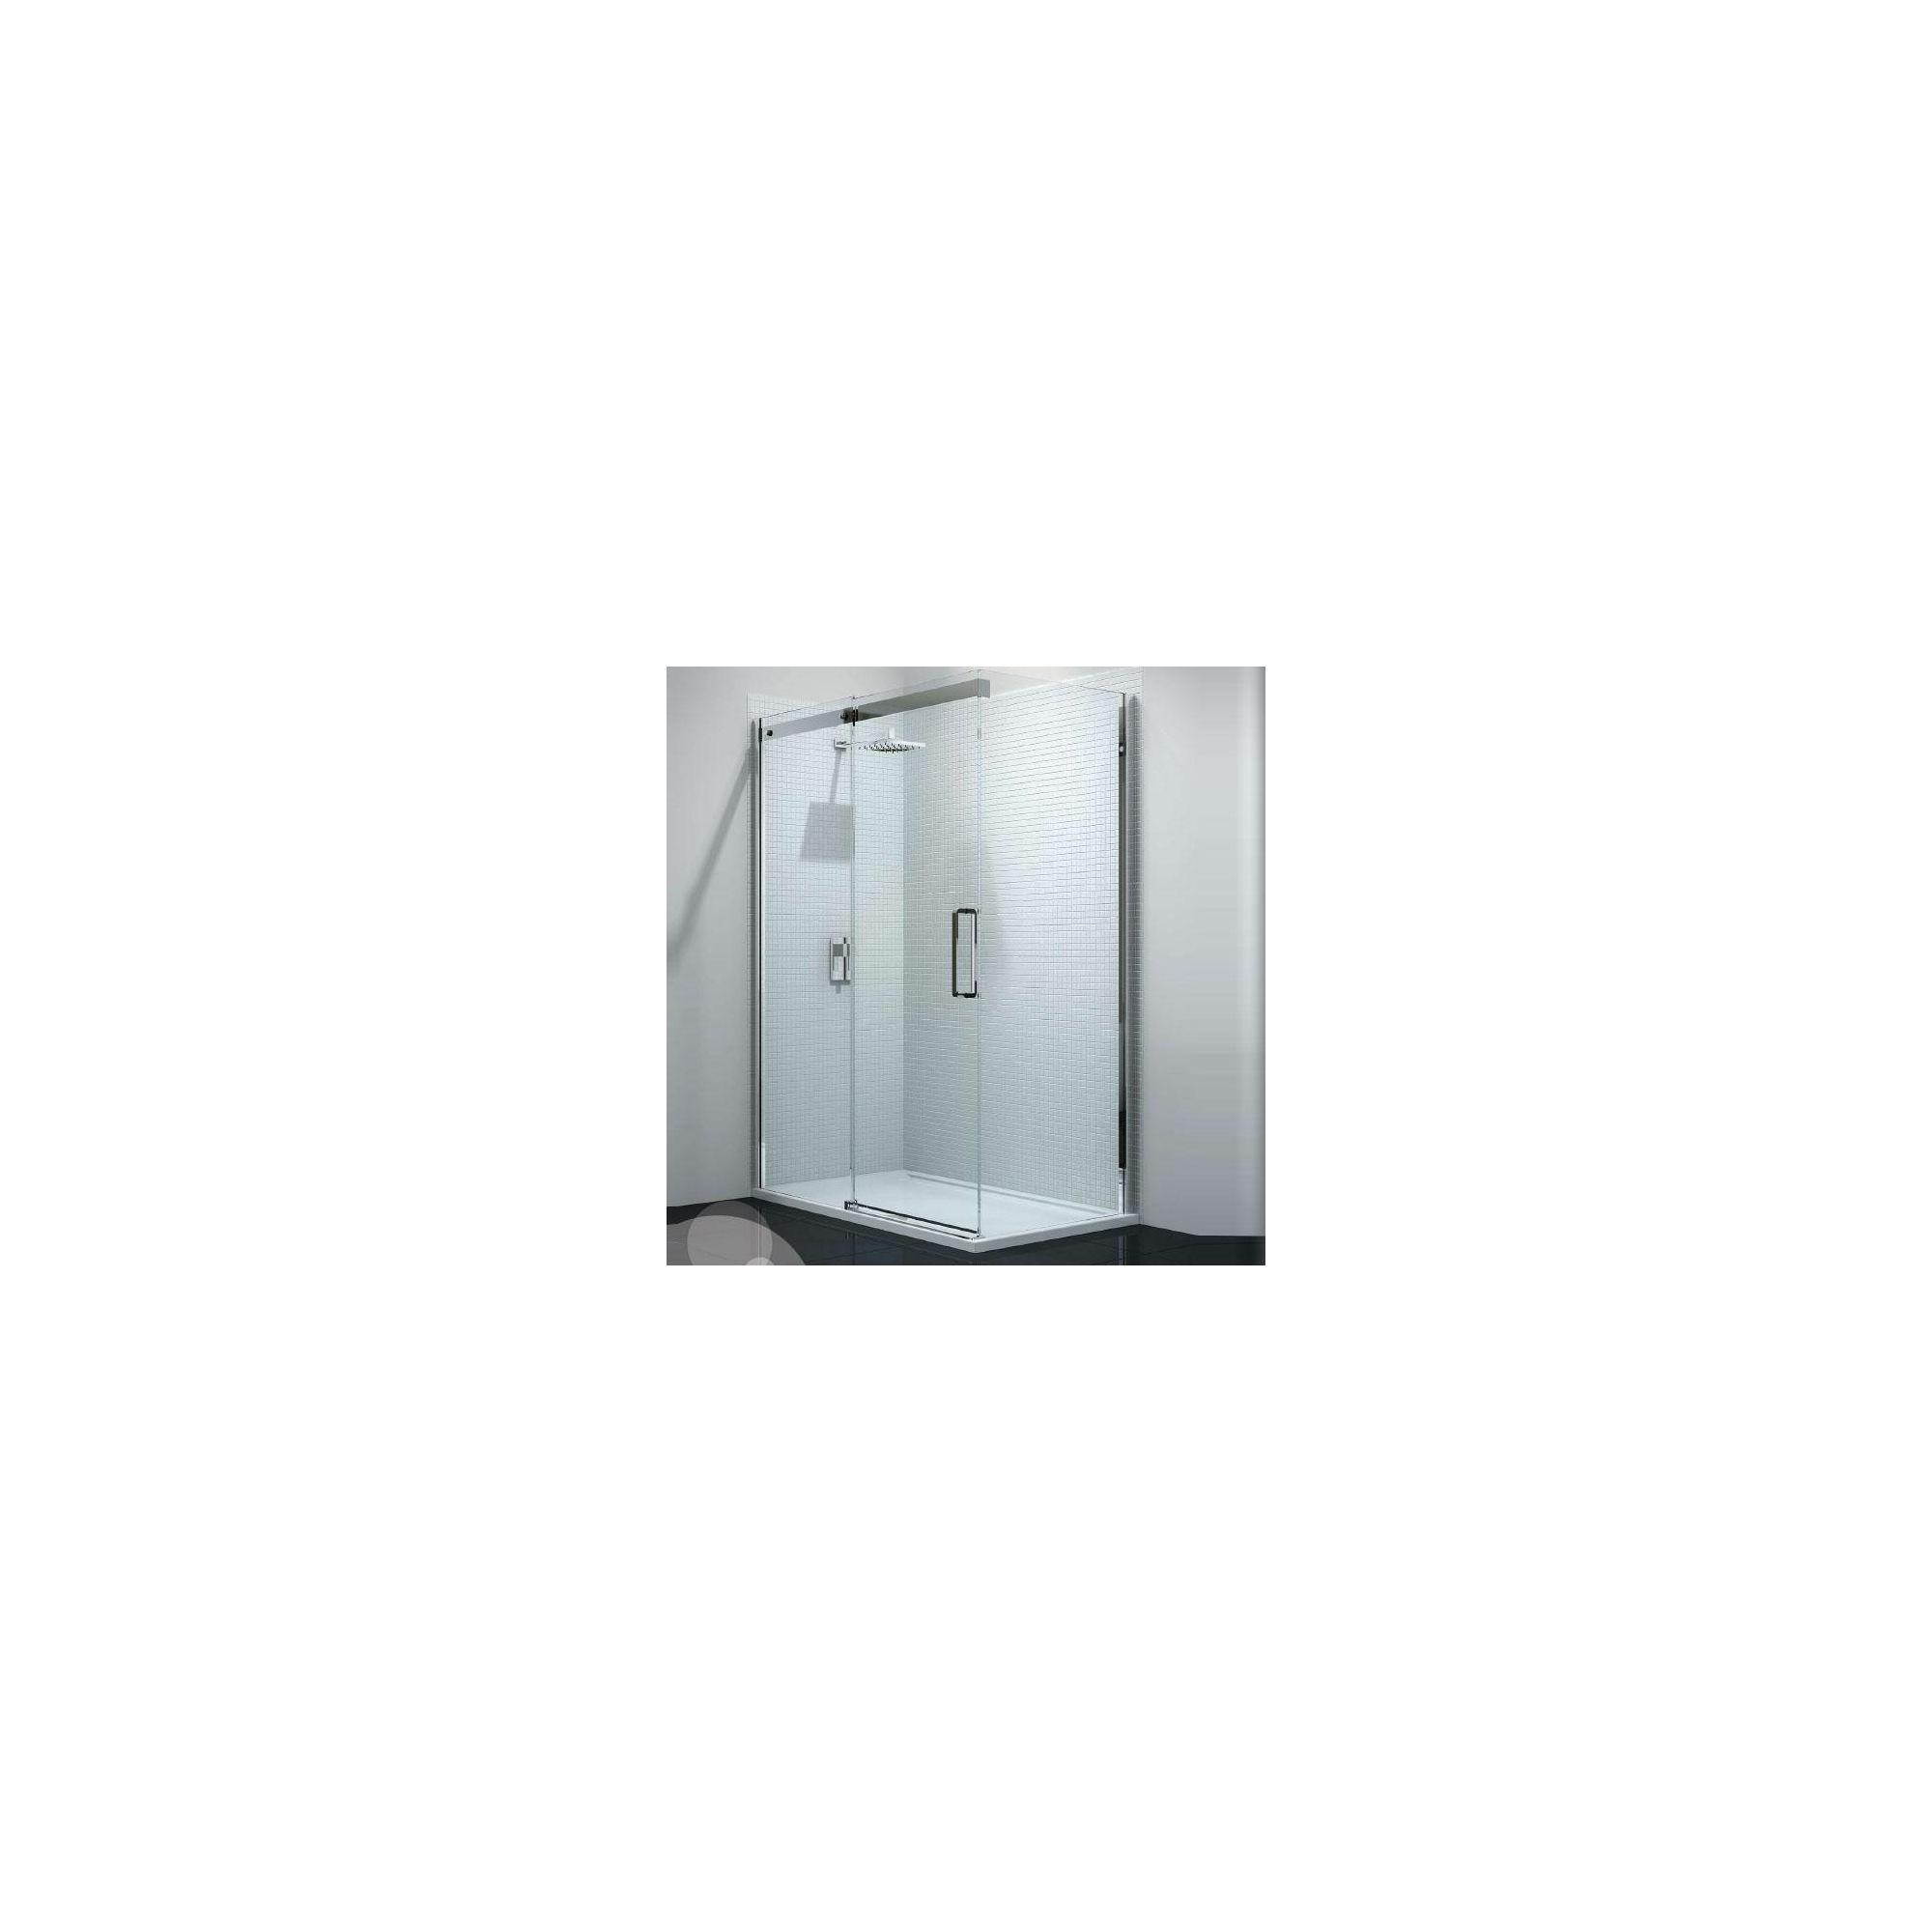 Merlyn Vivid Ten Sliding Door Shower Enclosure, 1400mm x 900mm, Low Profile Tray, 10mm Glass at Tesco Direct